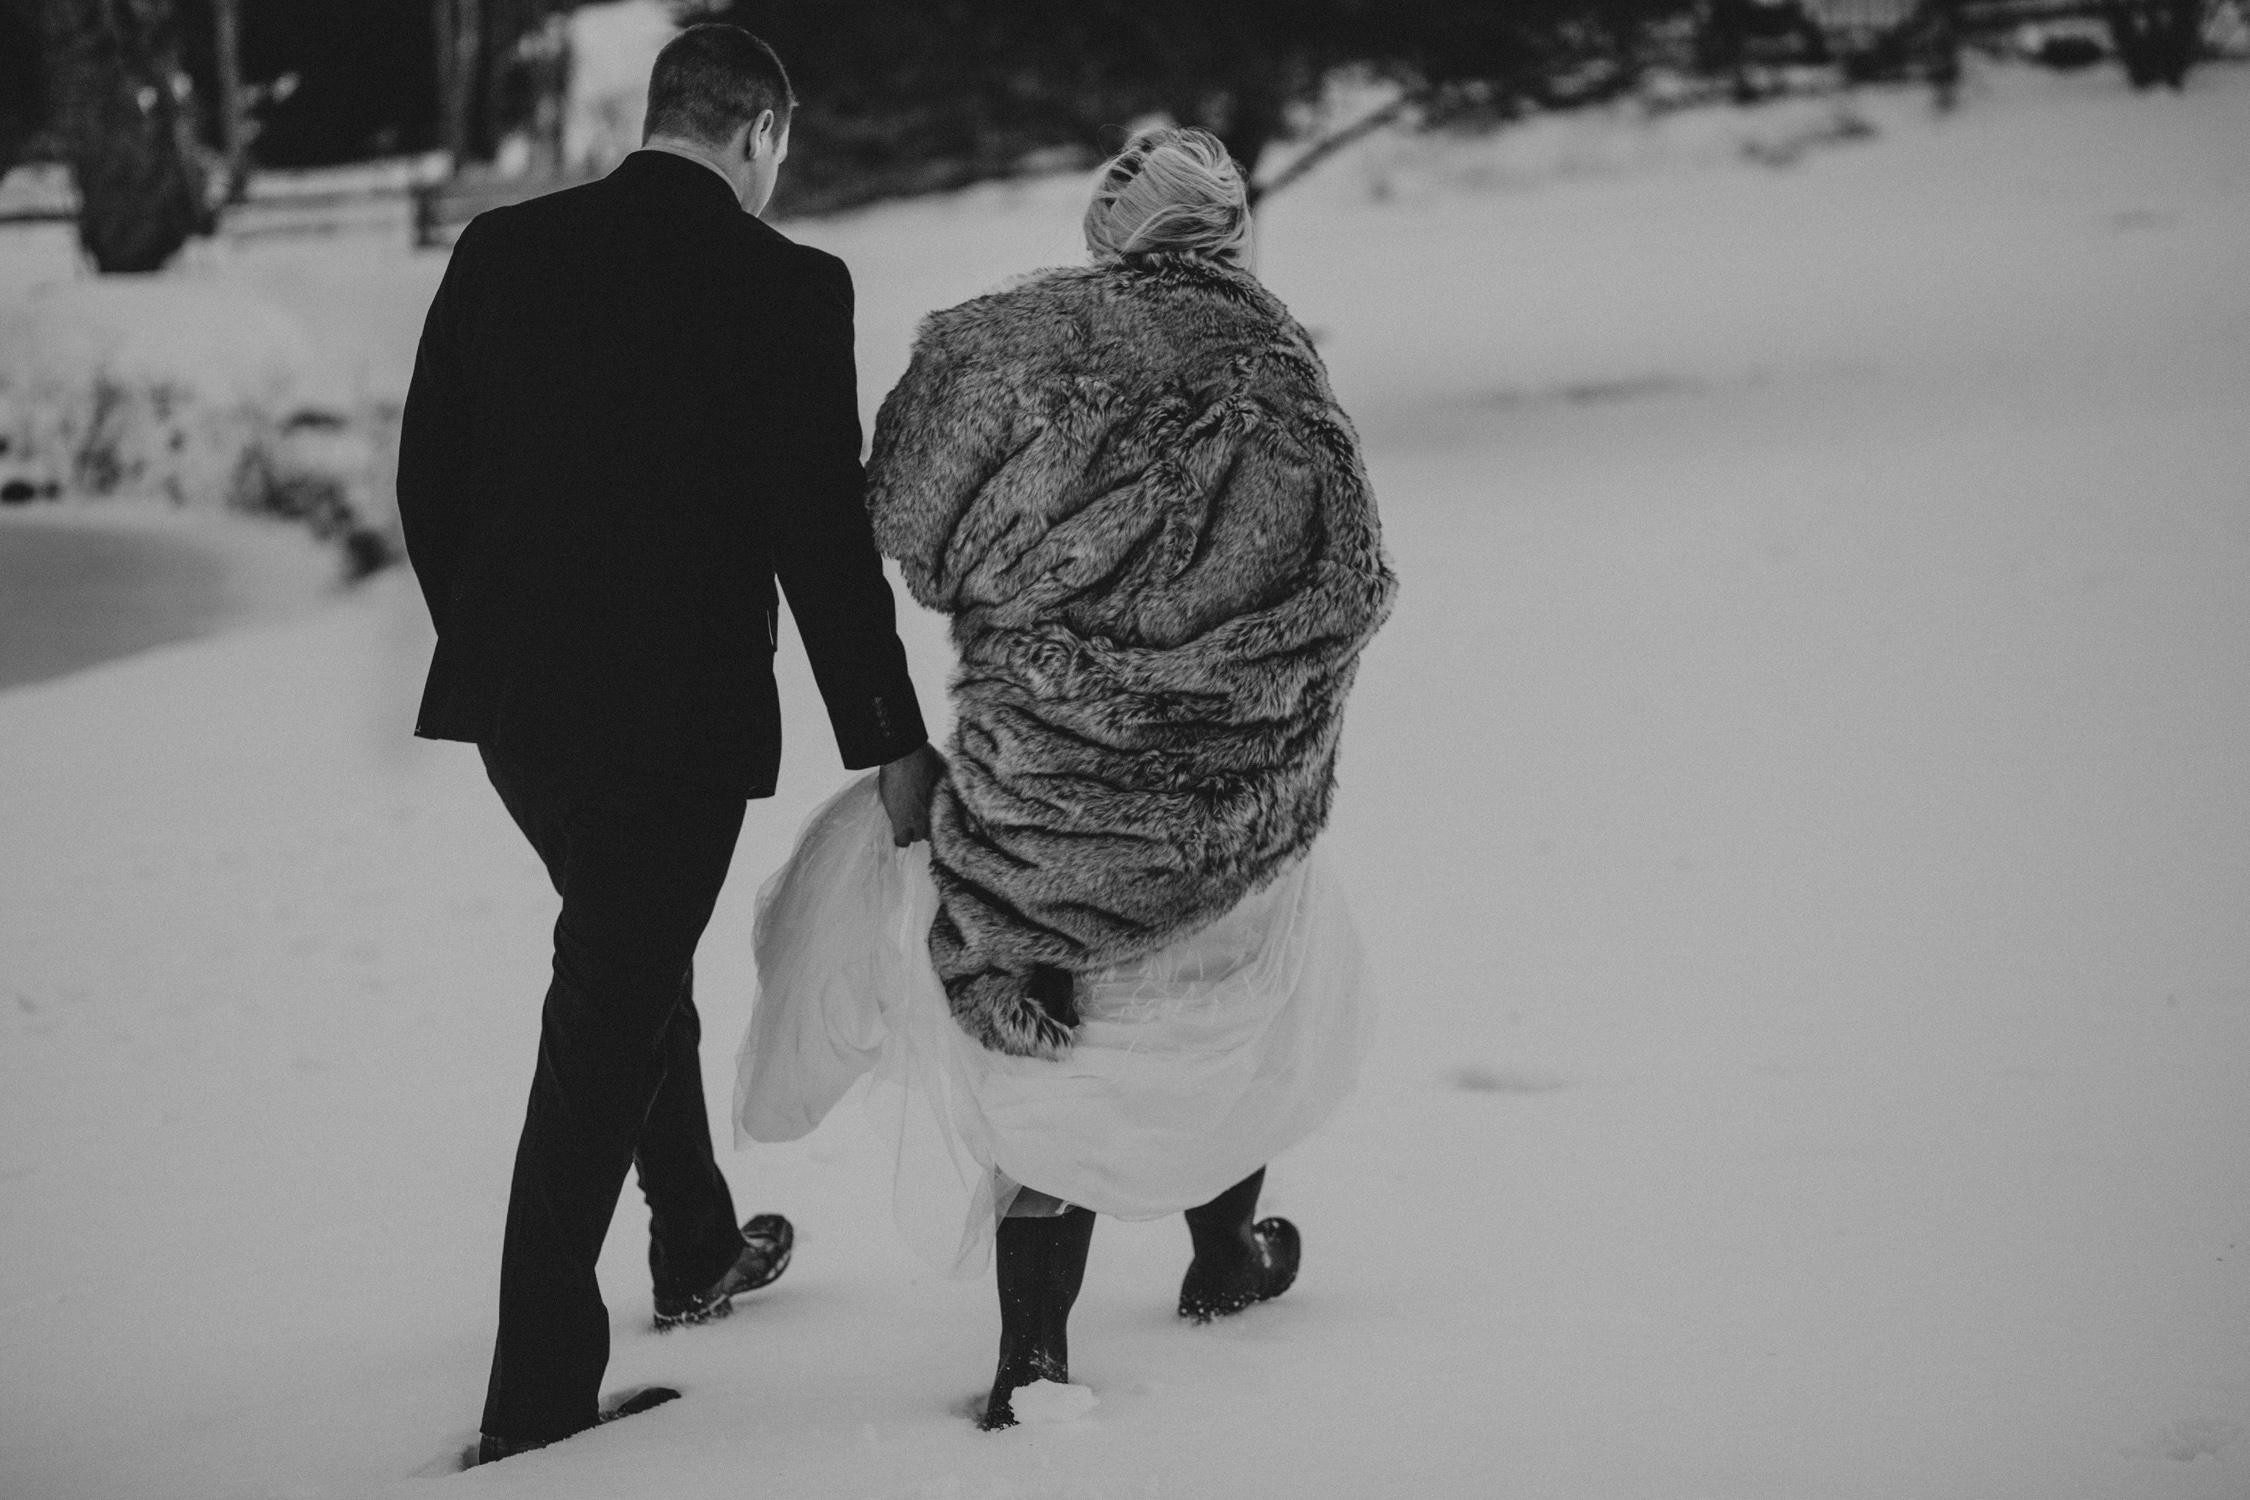 mnd_farm_winter_wedding_041.jpg